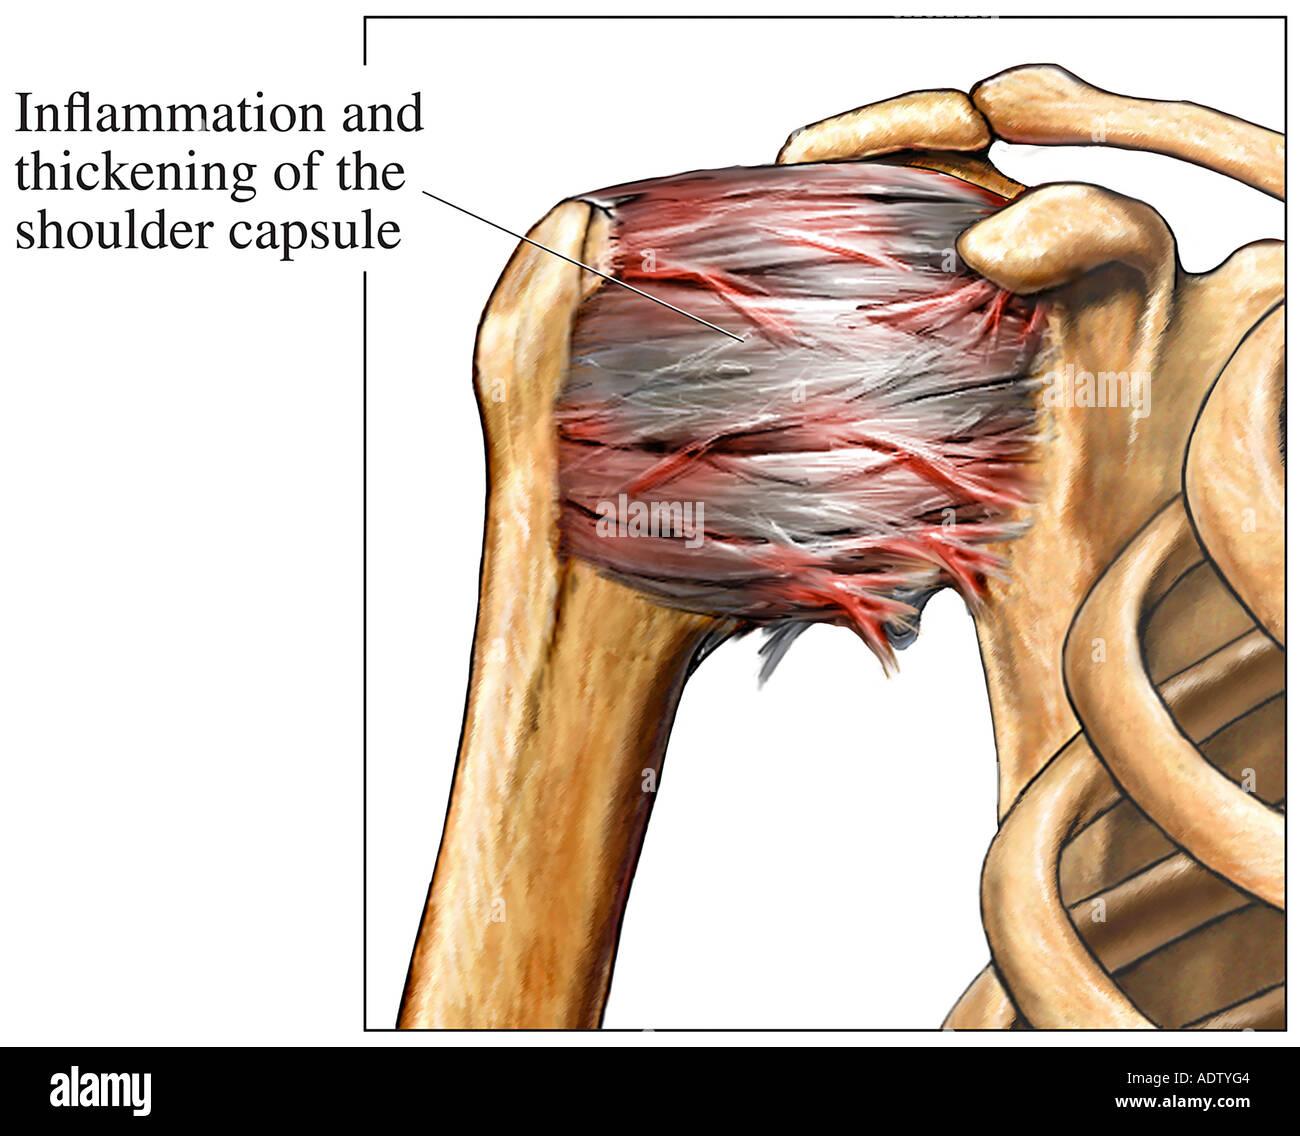 Adhesive Capsulitis of the Shoulder Stock Photo: 7710787 - Alamy